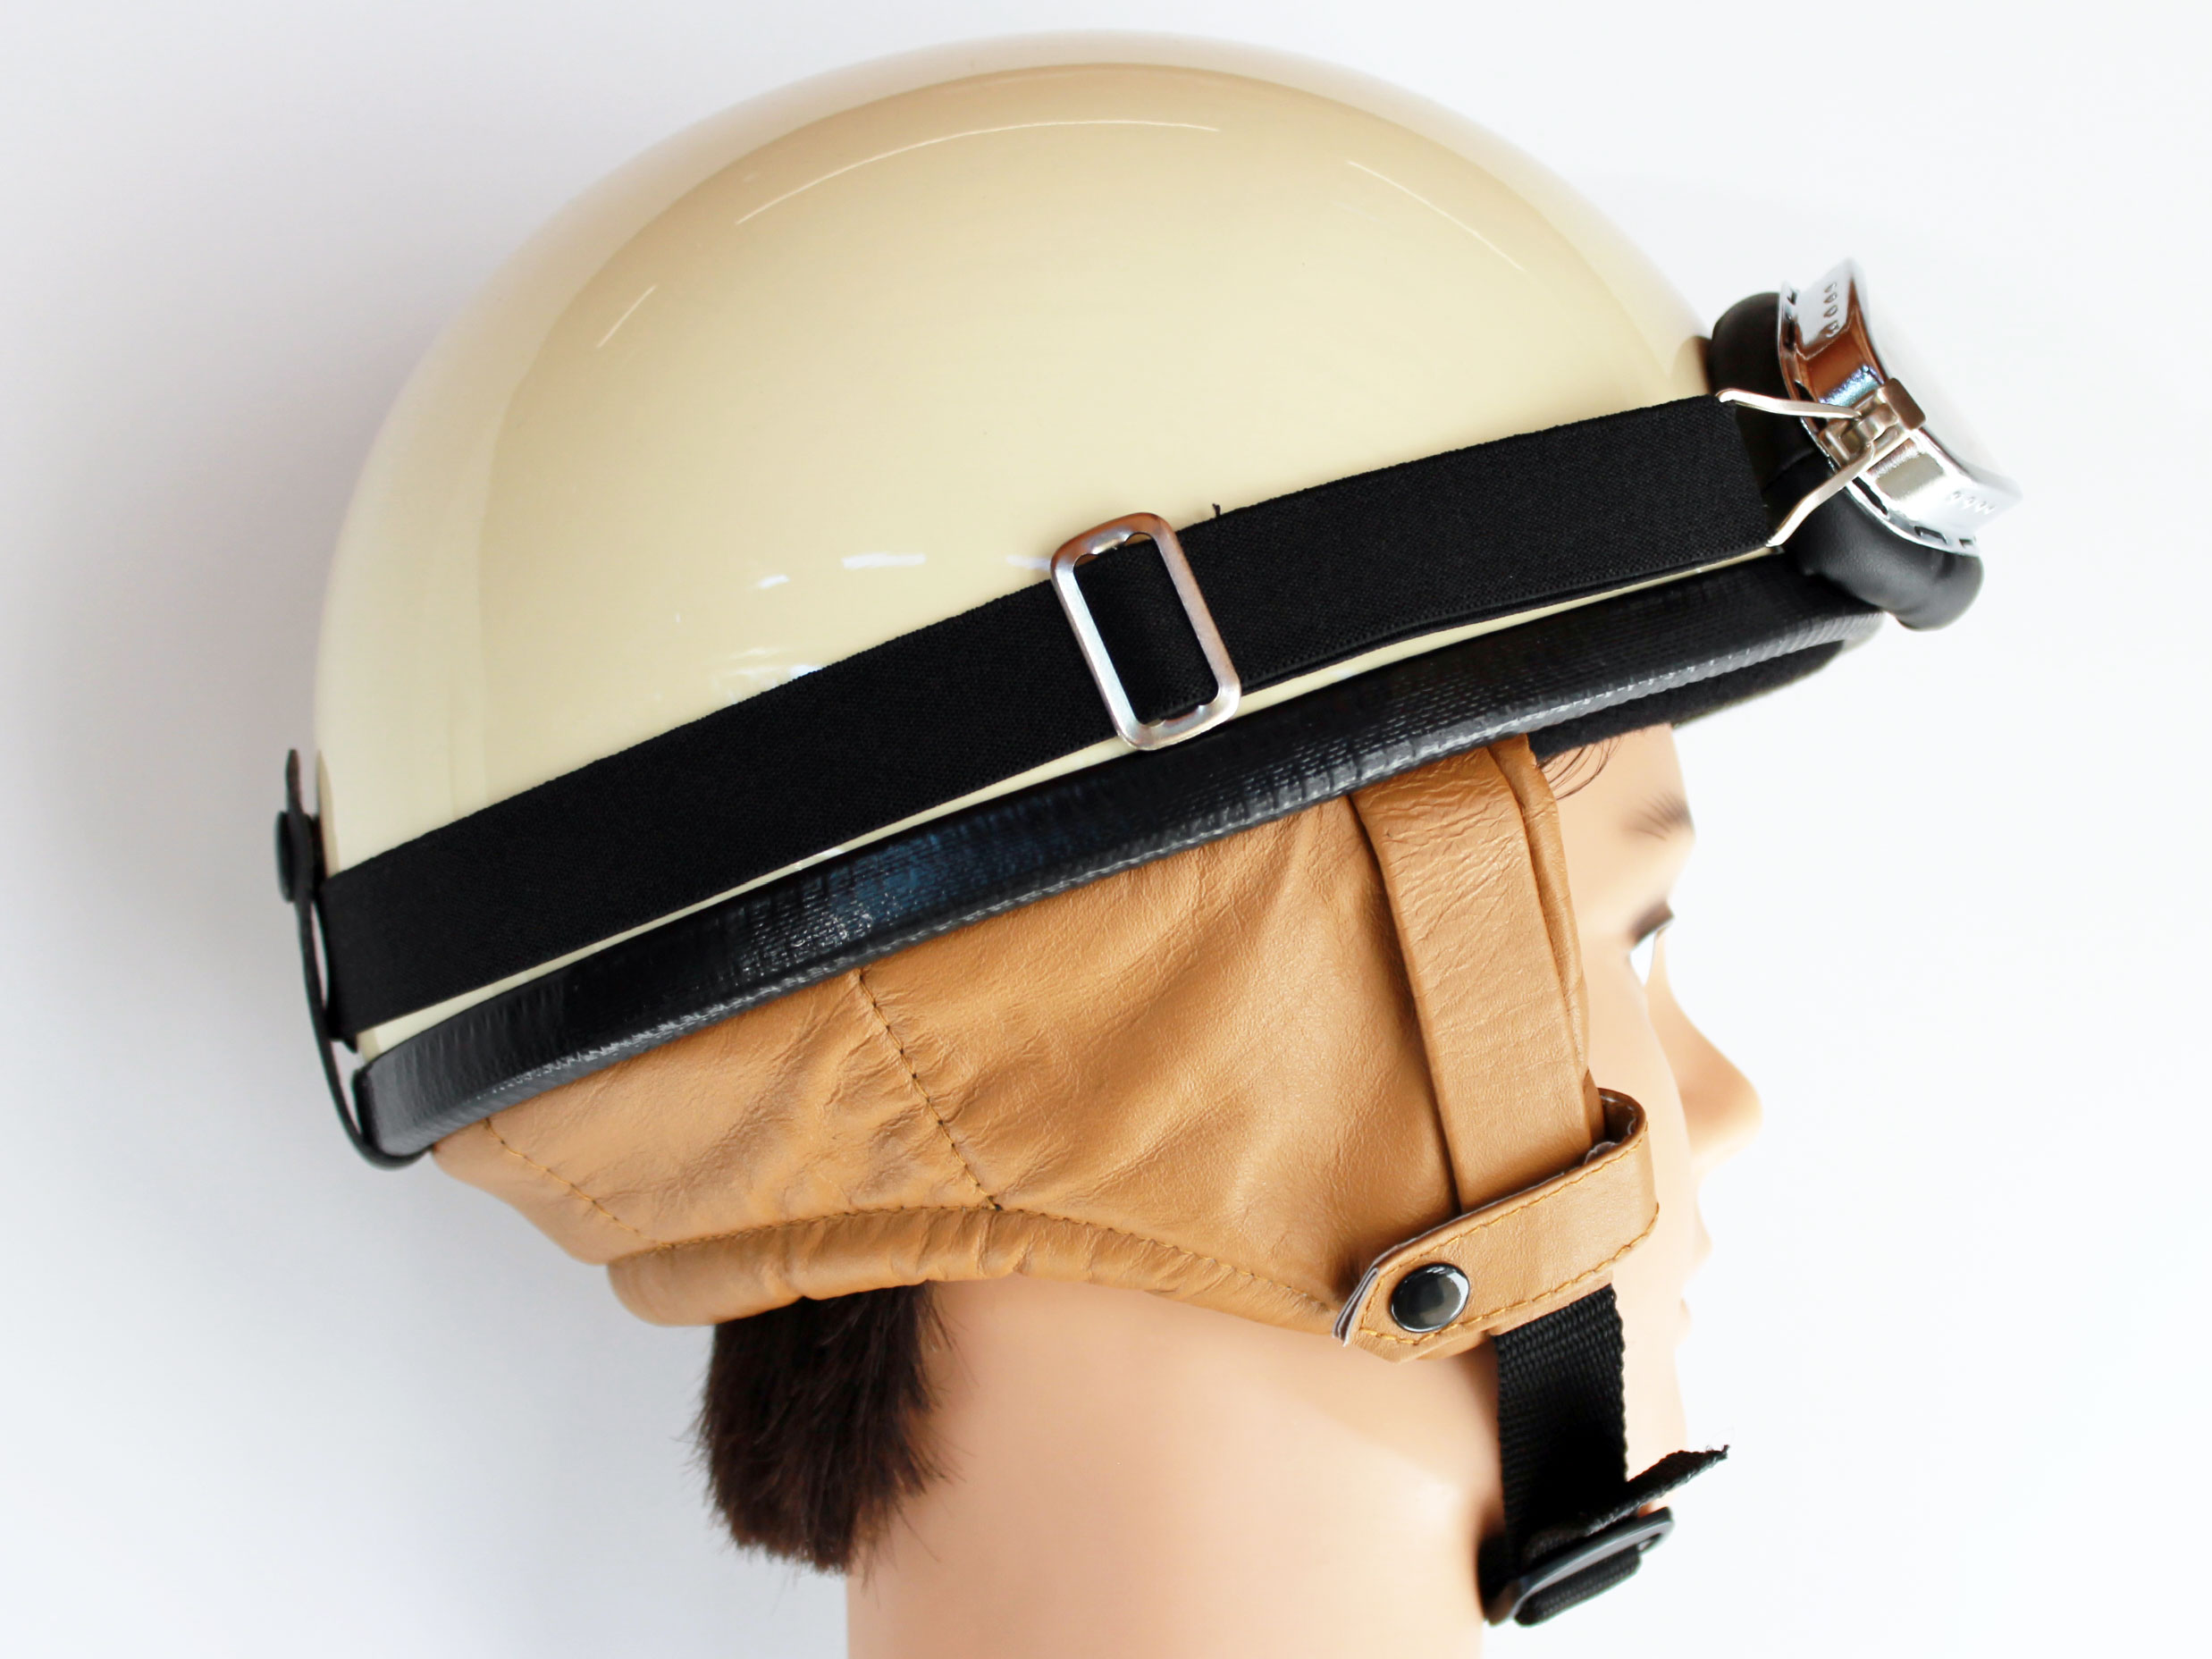 helm halbschale rb 500 elfenbein gr e m mit brille helm. Black Bedroom Furniture Sets. Home Design Ideas